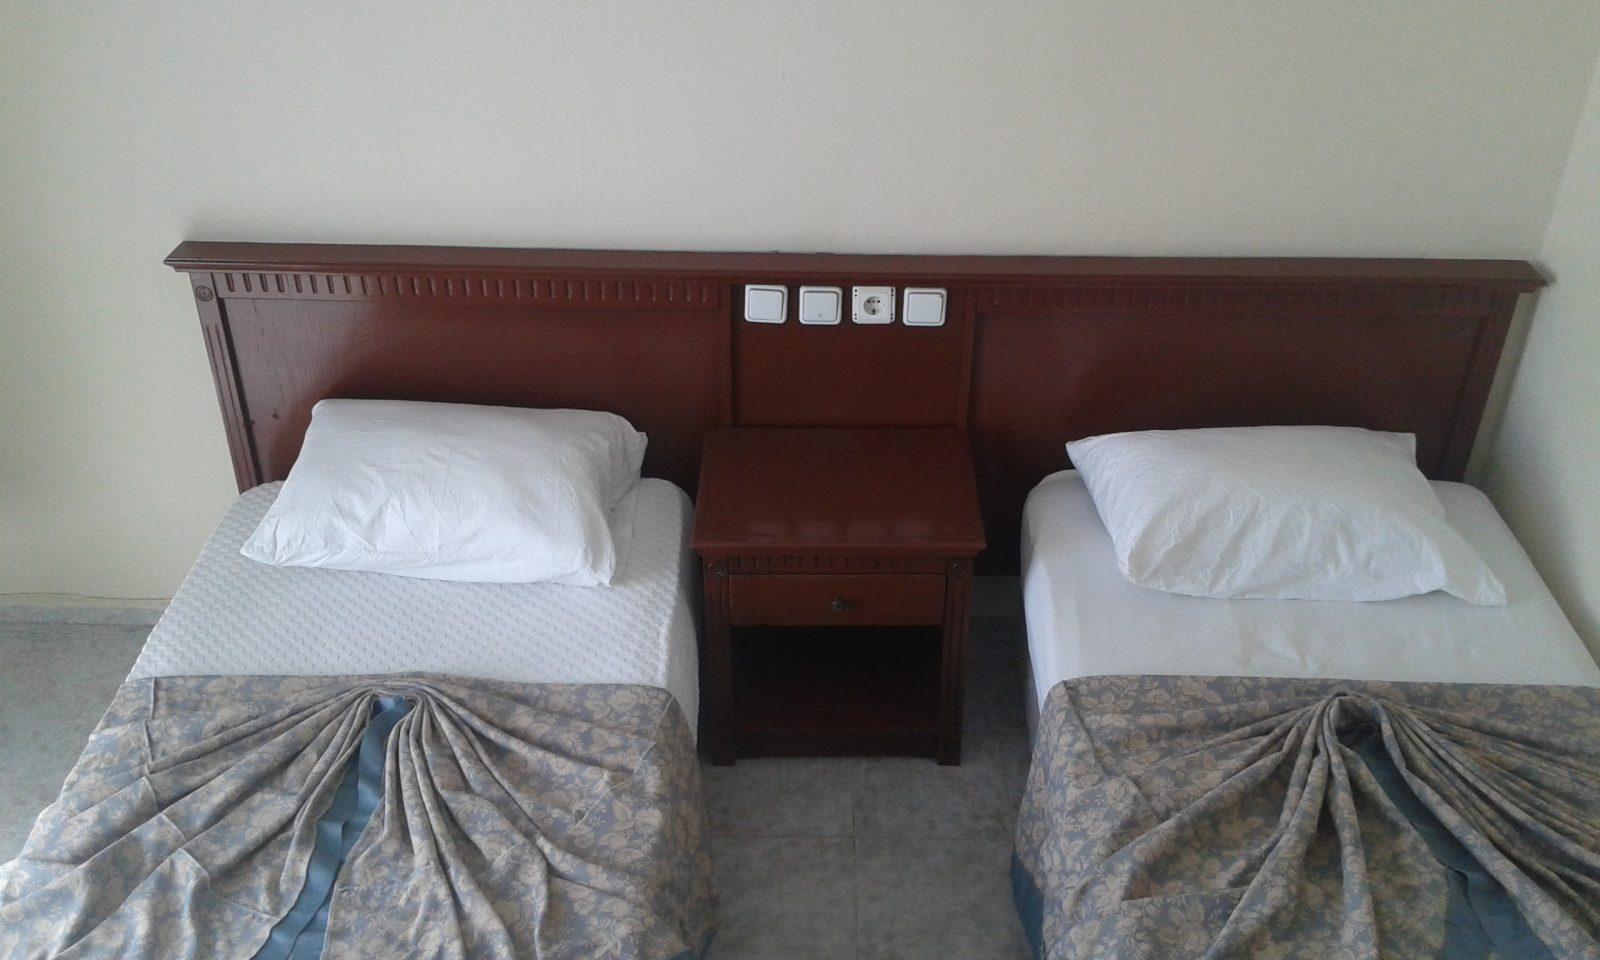 Letovanje Turska autobusom, Kusadasi, Hotel Tecimen,soba twin bed